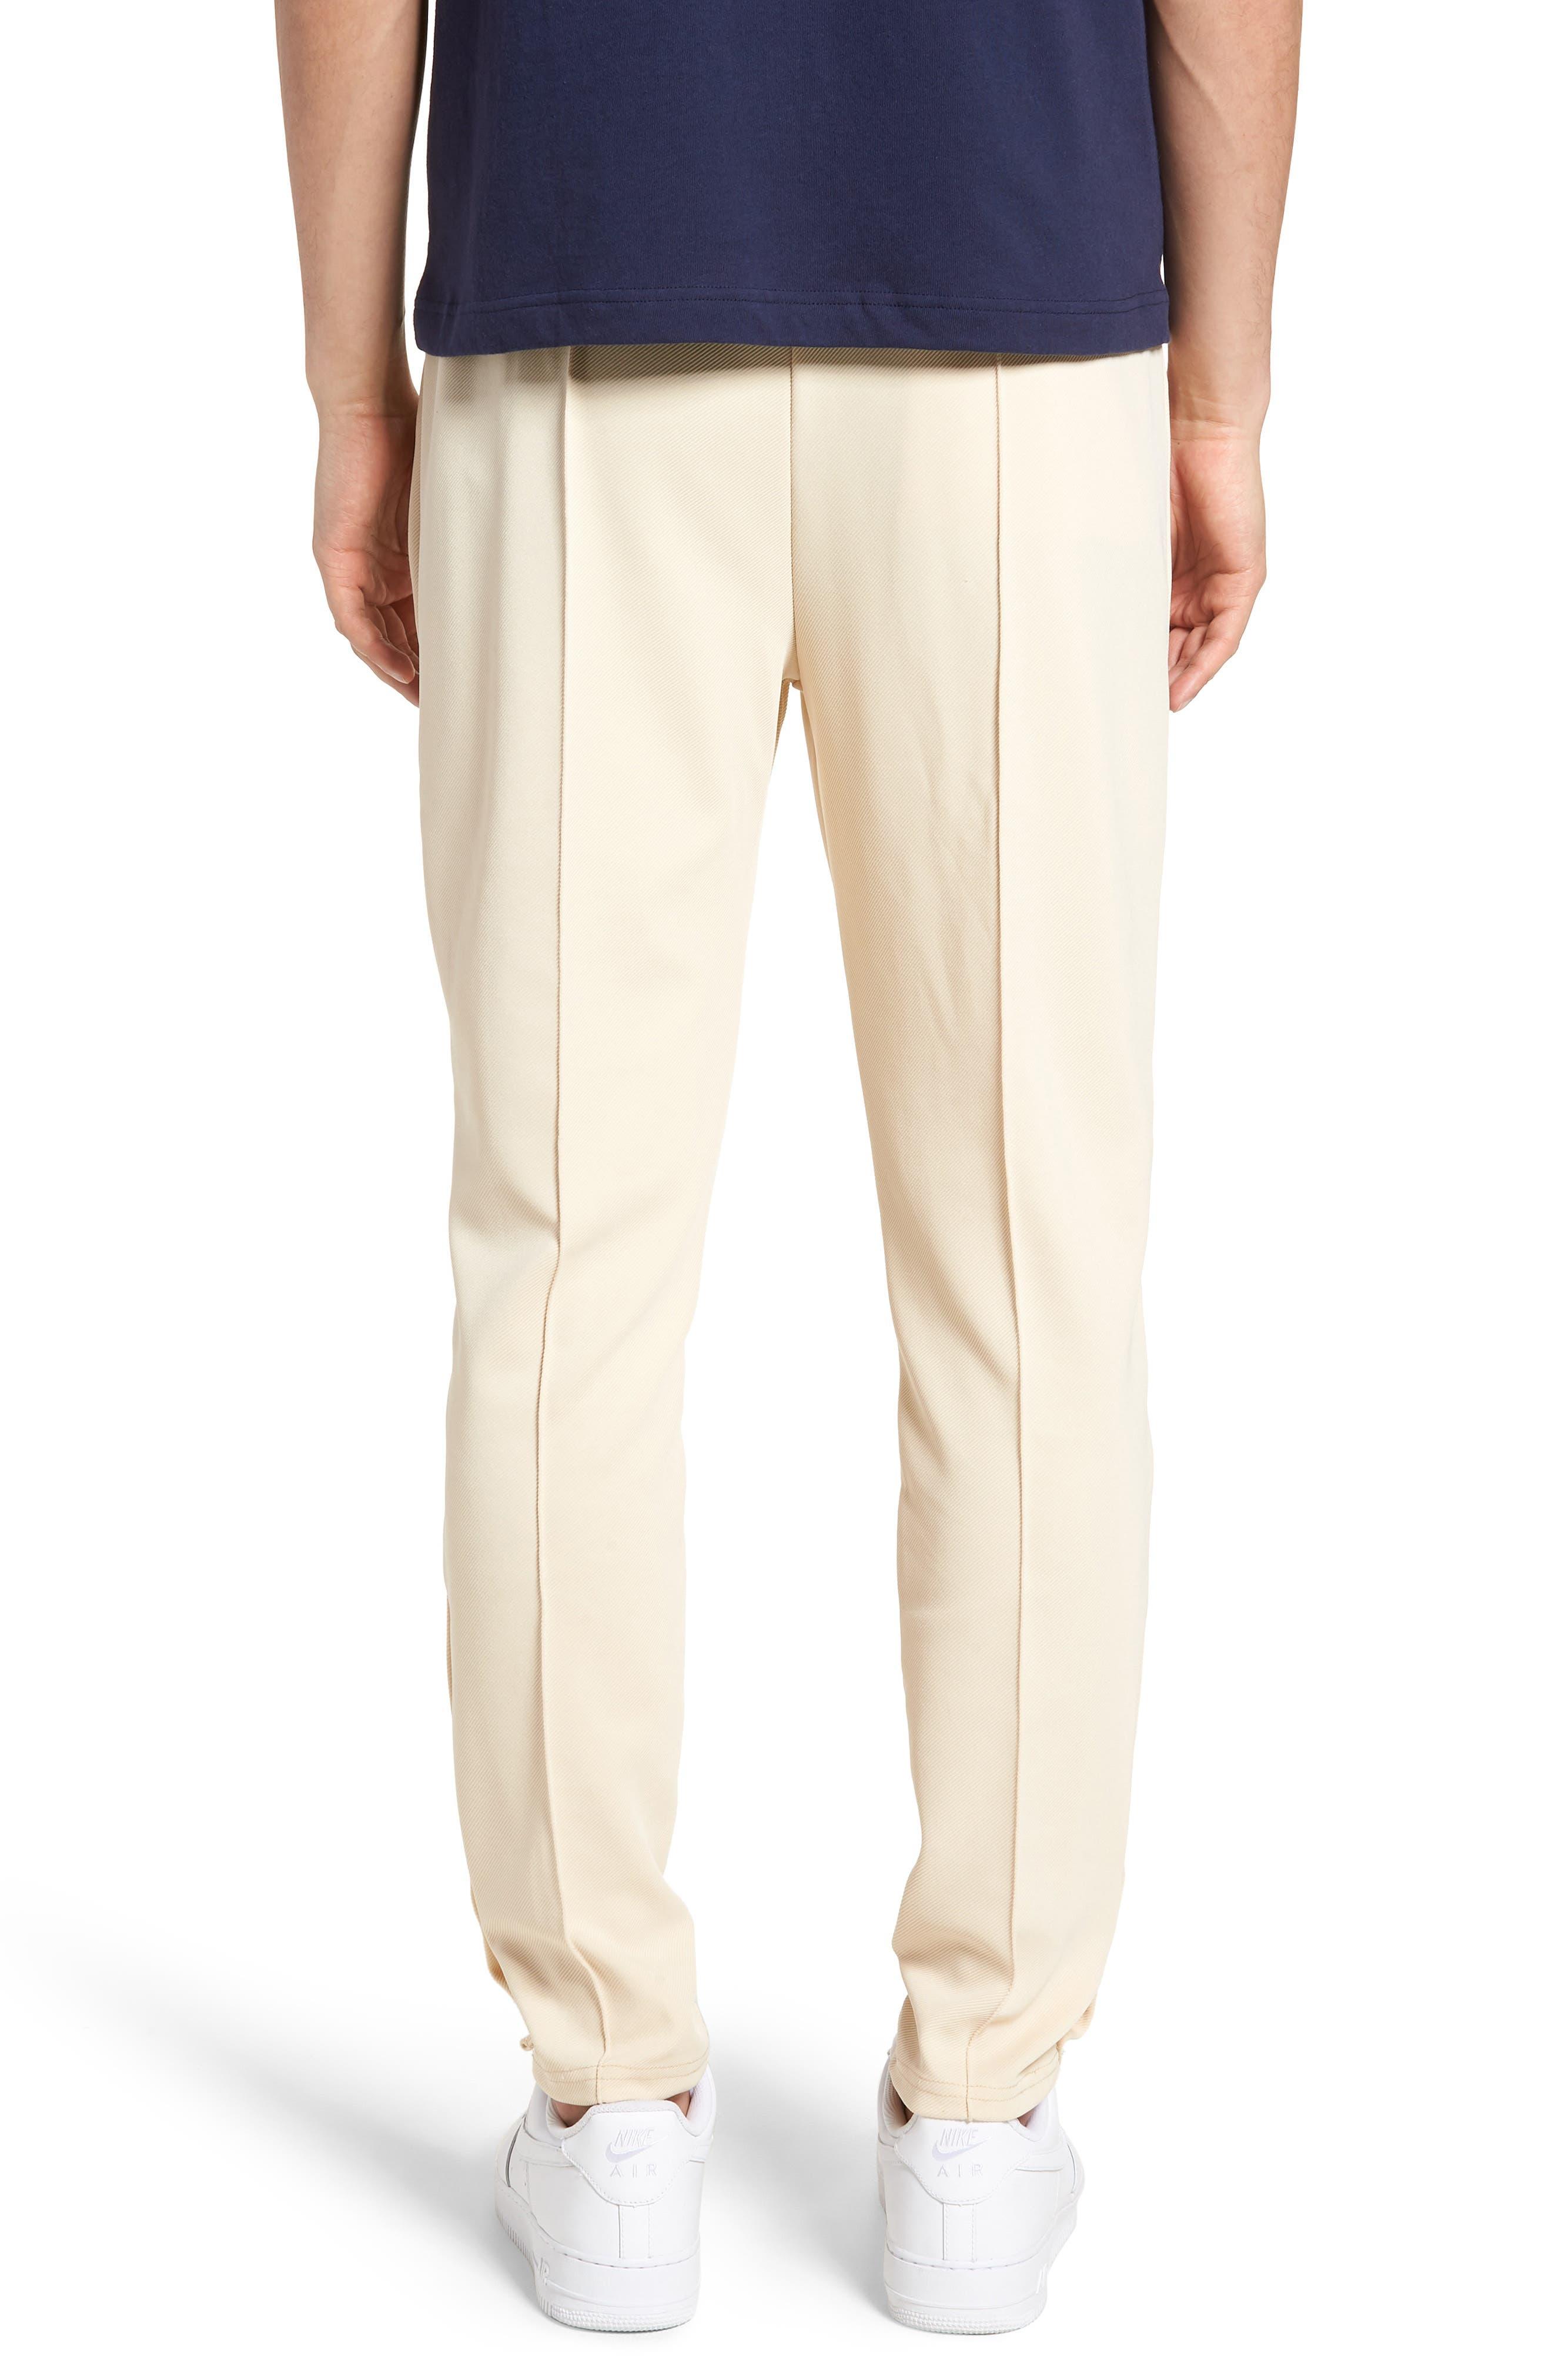 Molveno 2 Pants,                             Alternate thumbnail 2, color,                             250